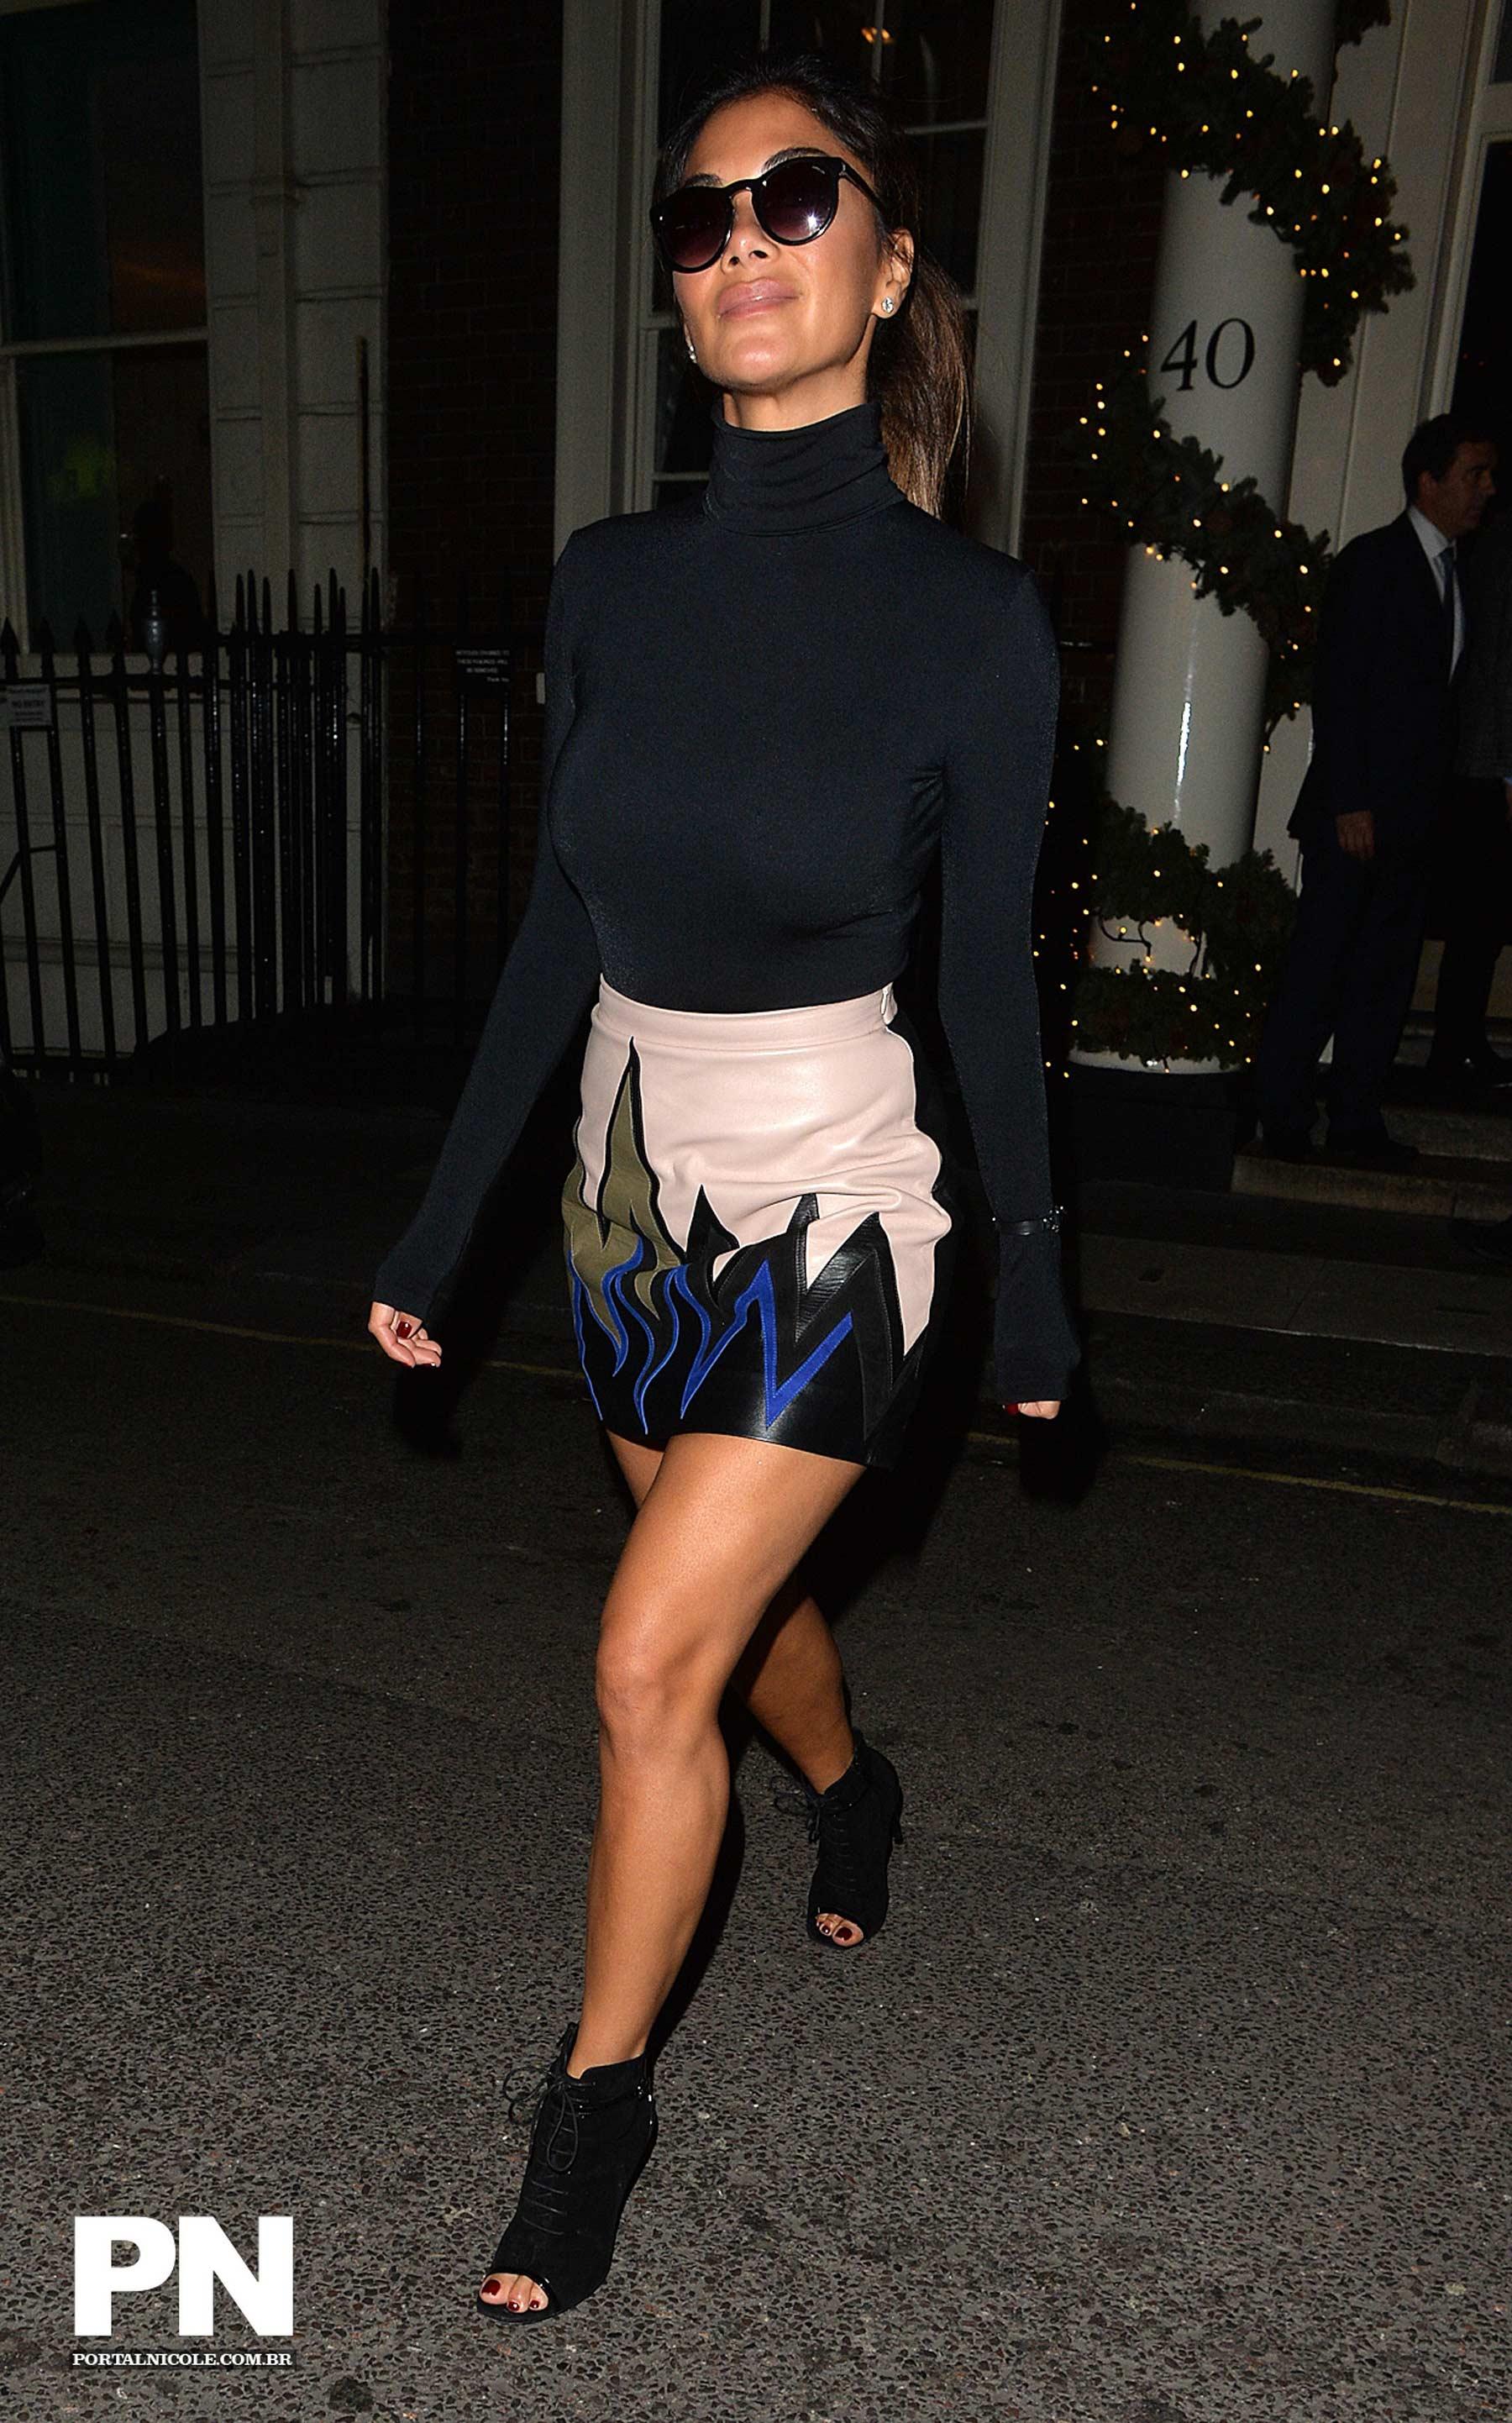 Nicole Scherzinger leaving The Arts Club